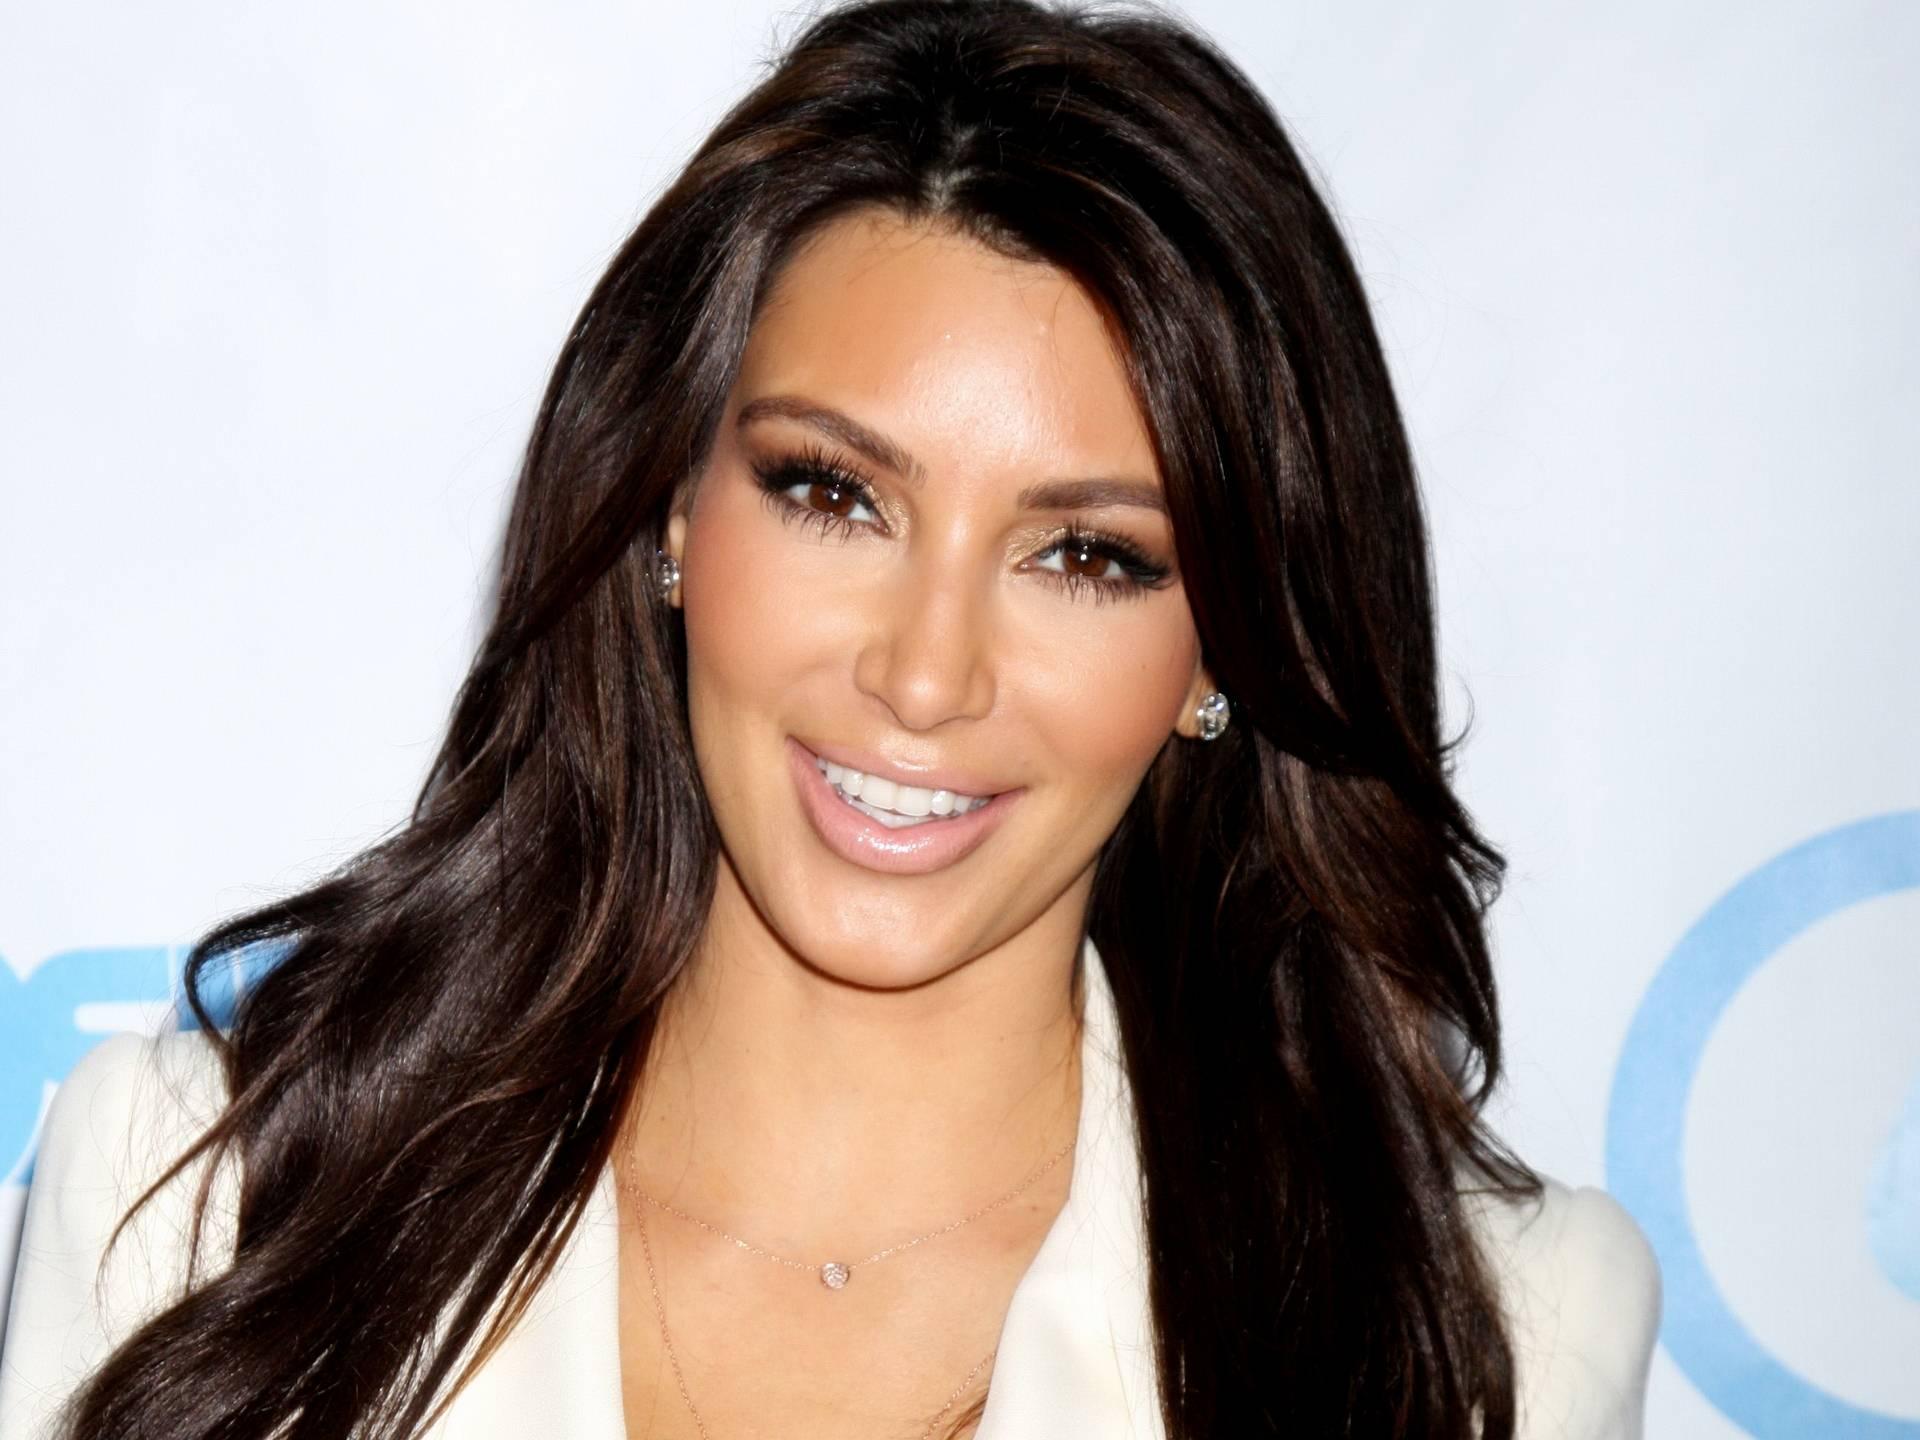 kim kardashian net worth - HD1920×1440